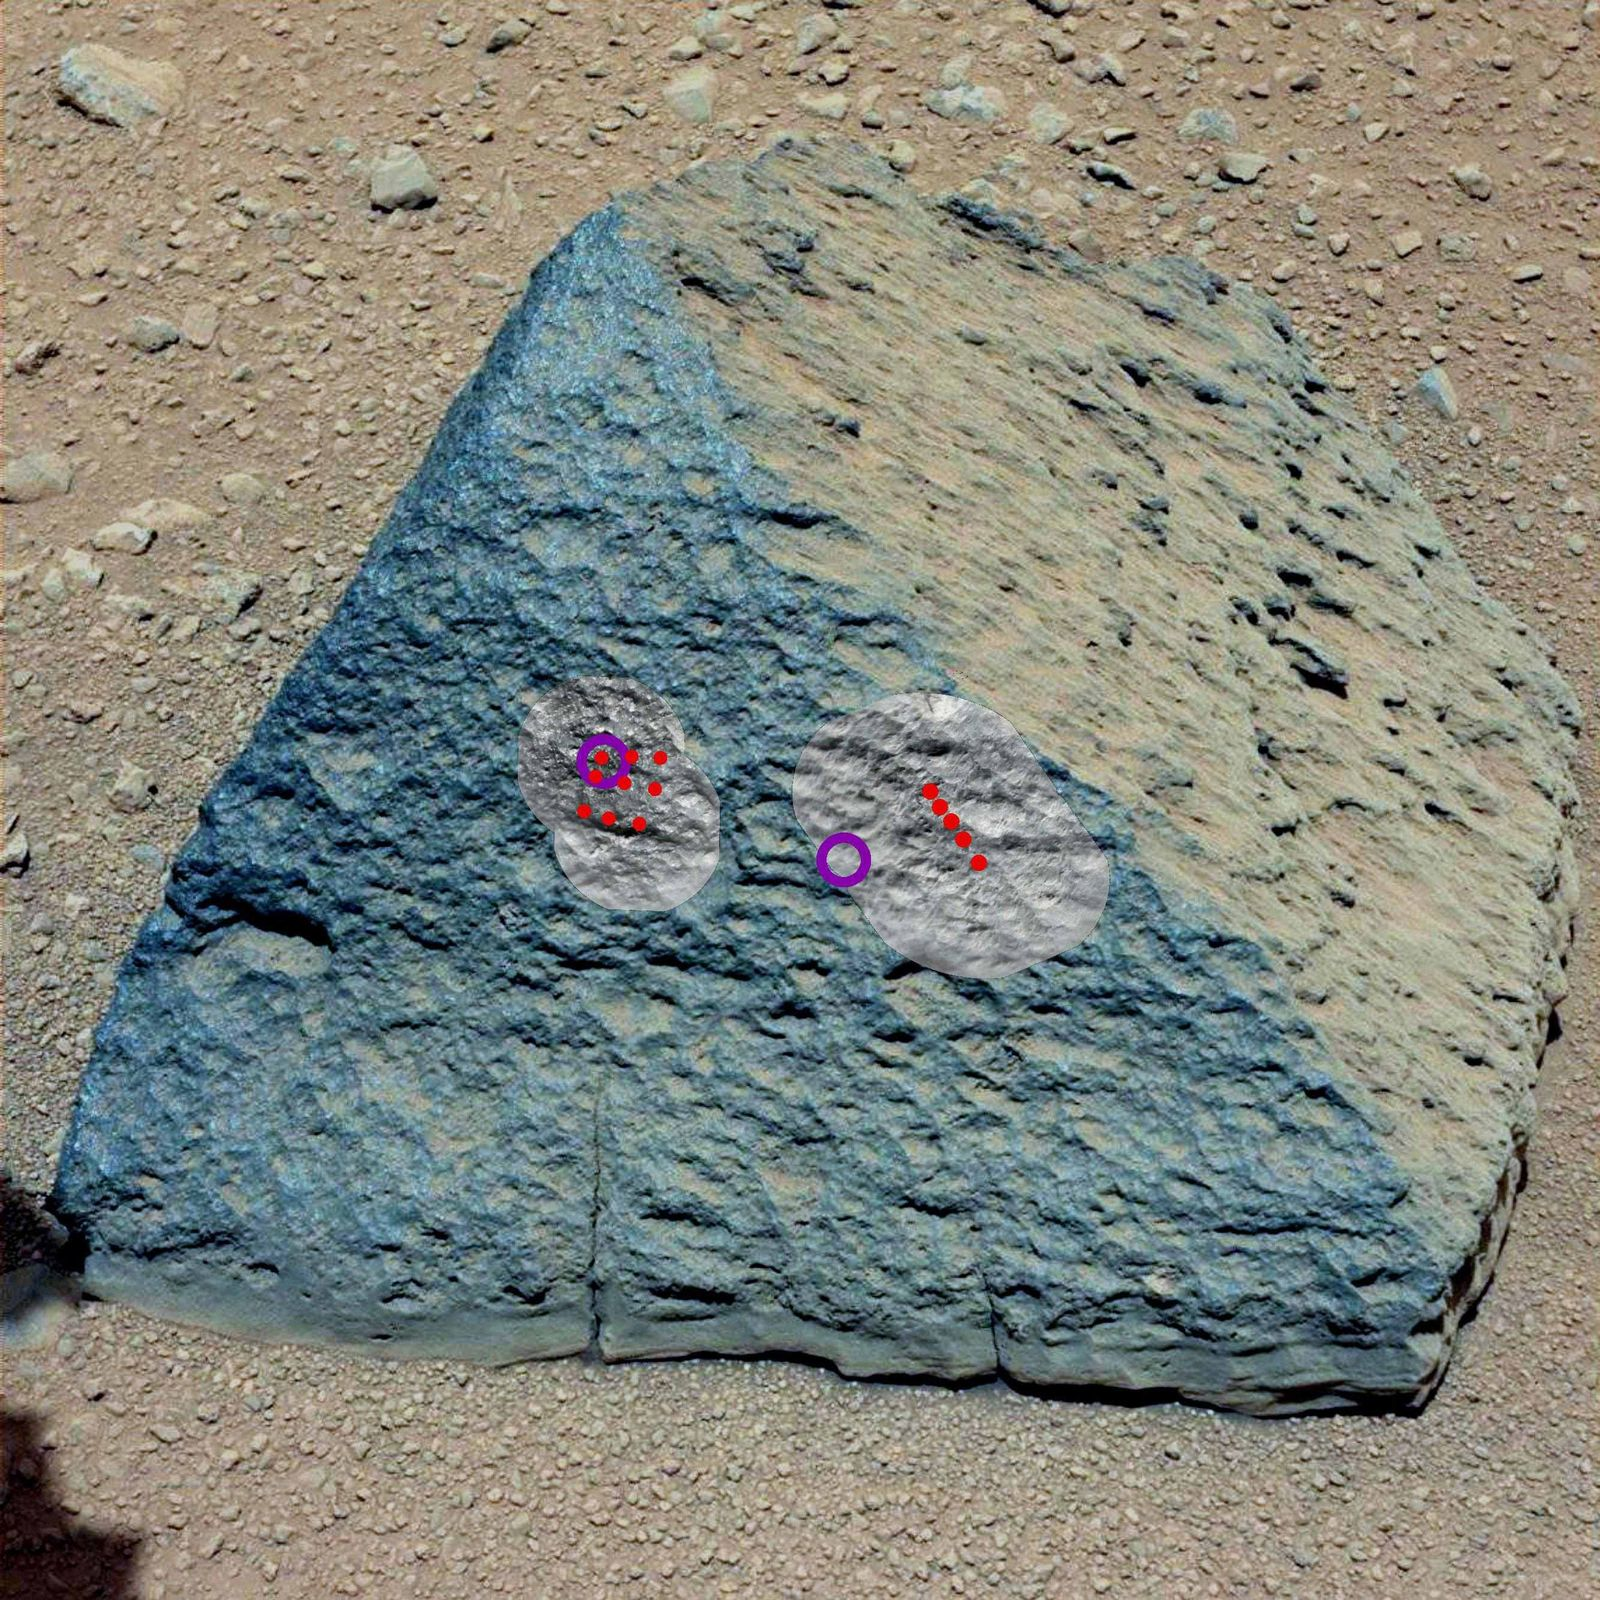 Matijevic / Mars / Curiosity